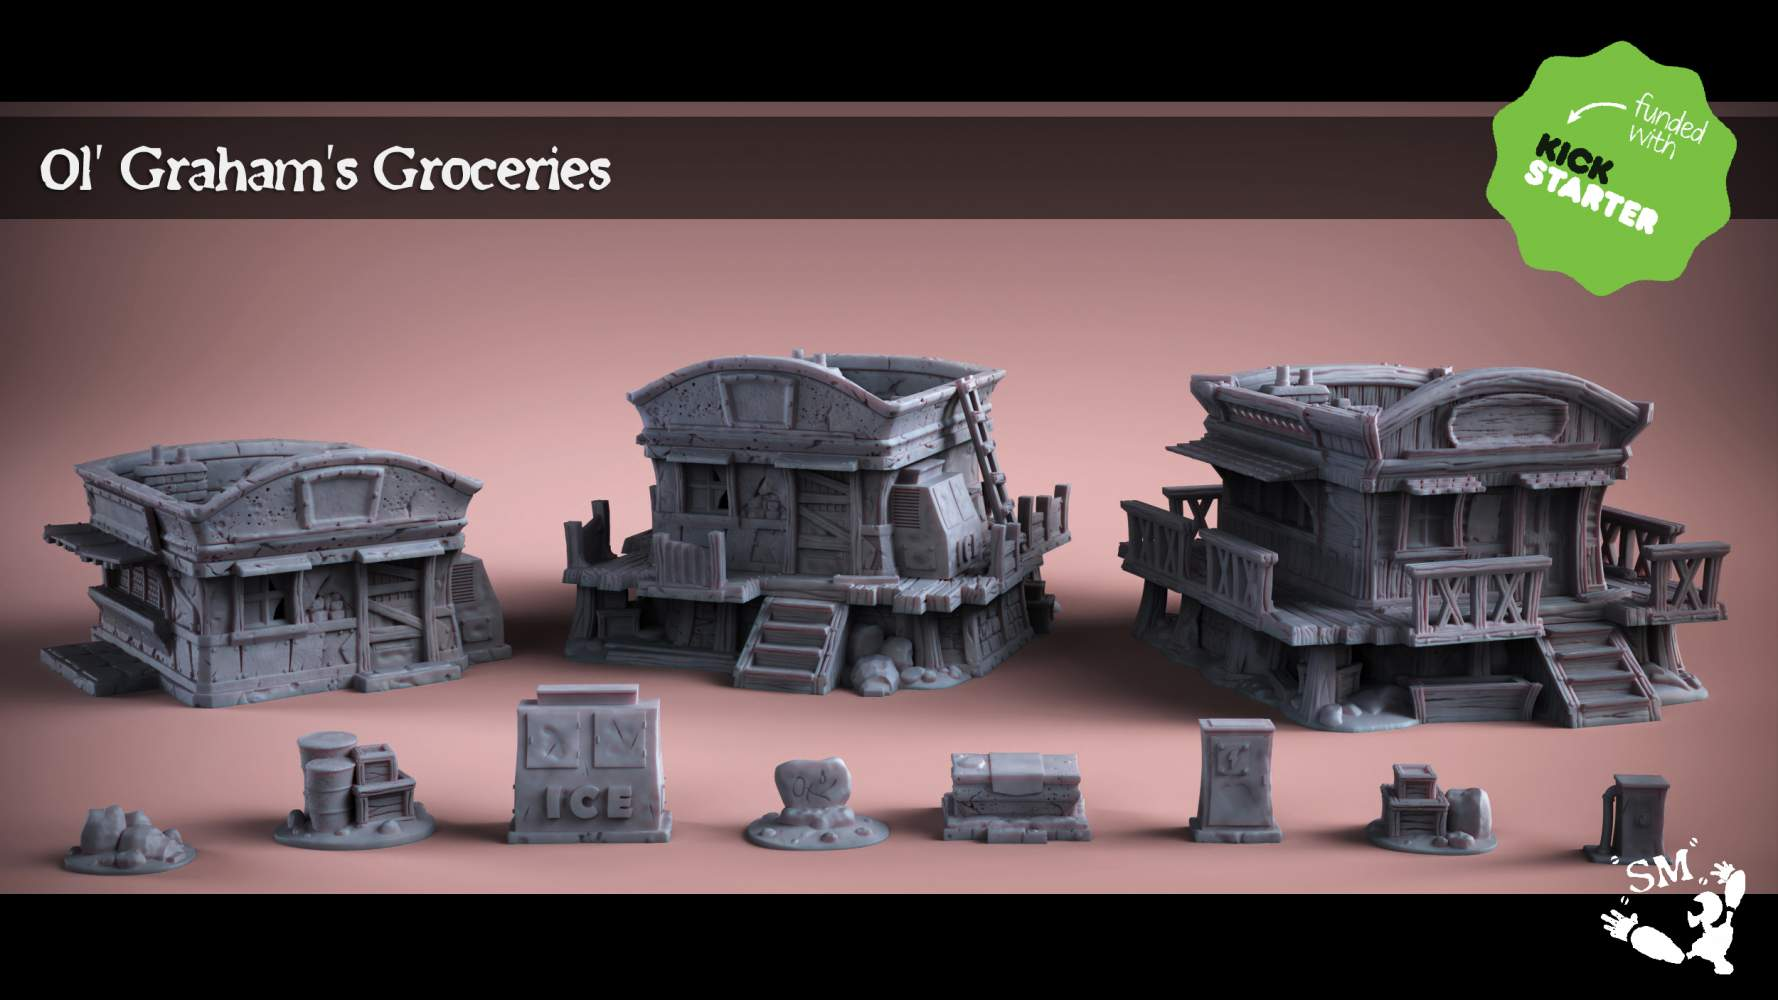 Ol' Graham's Groceries